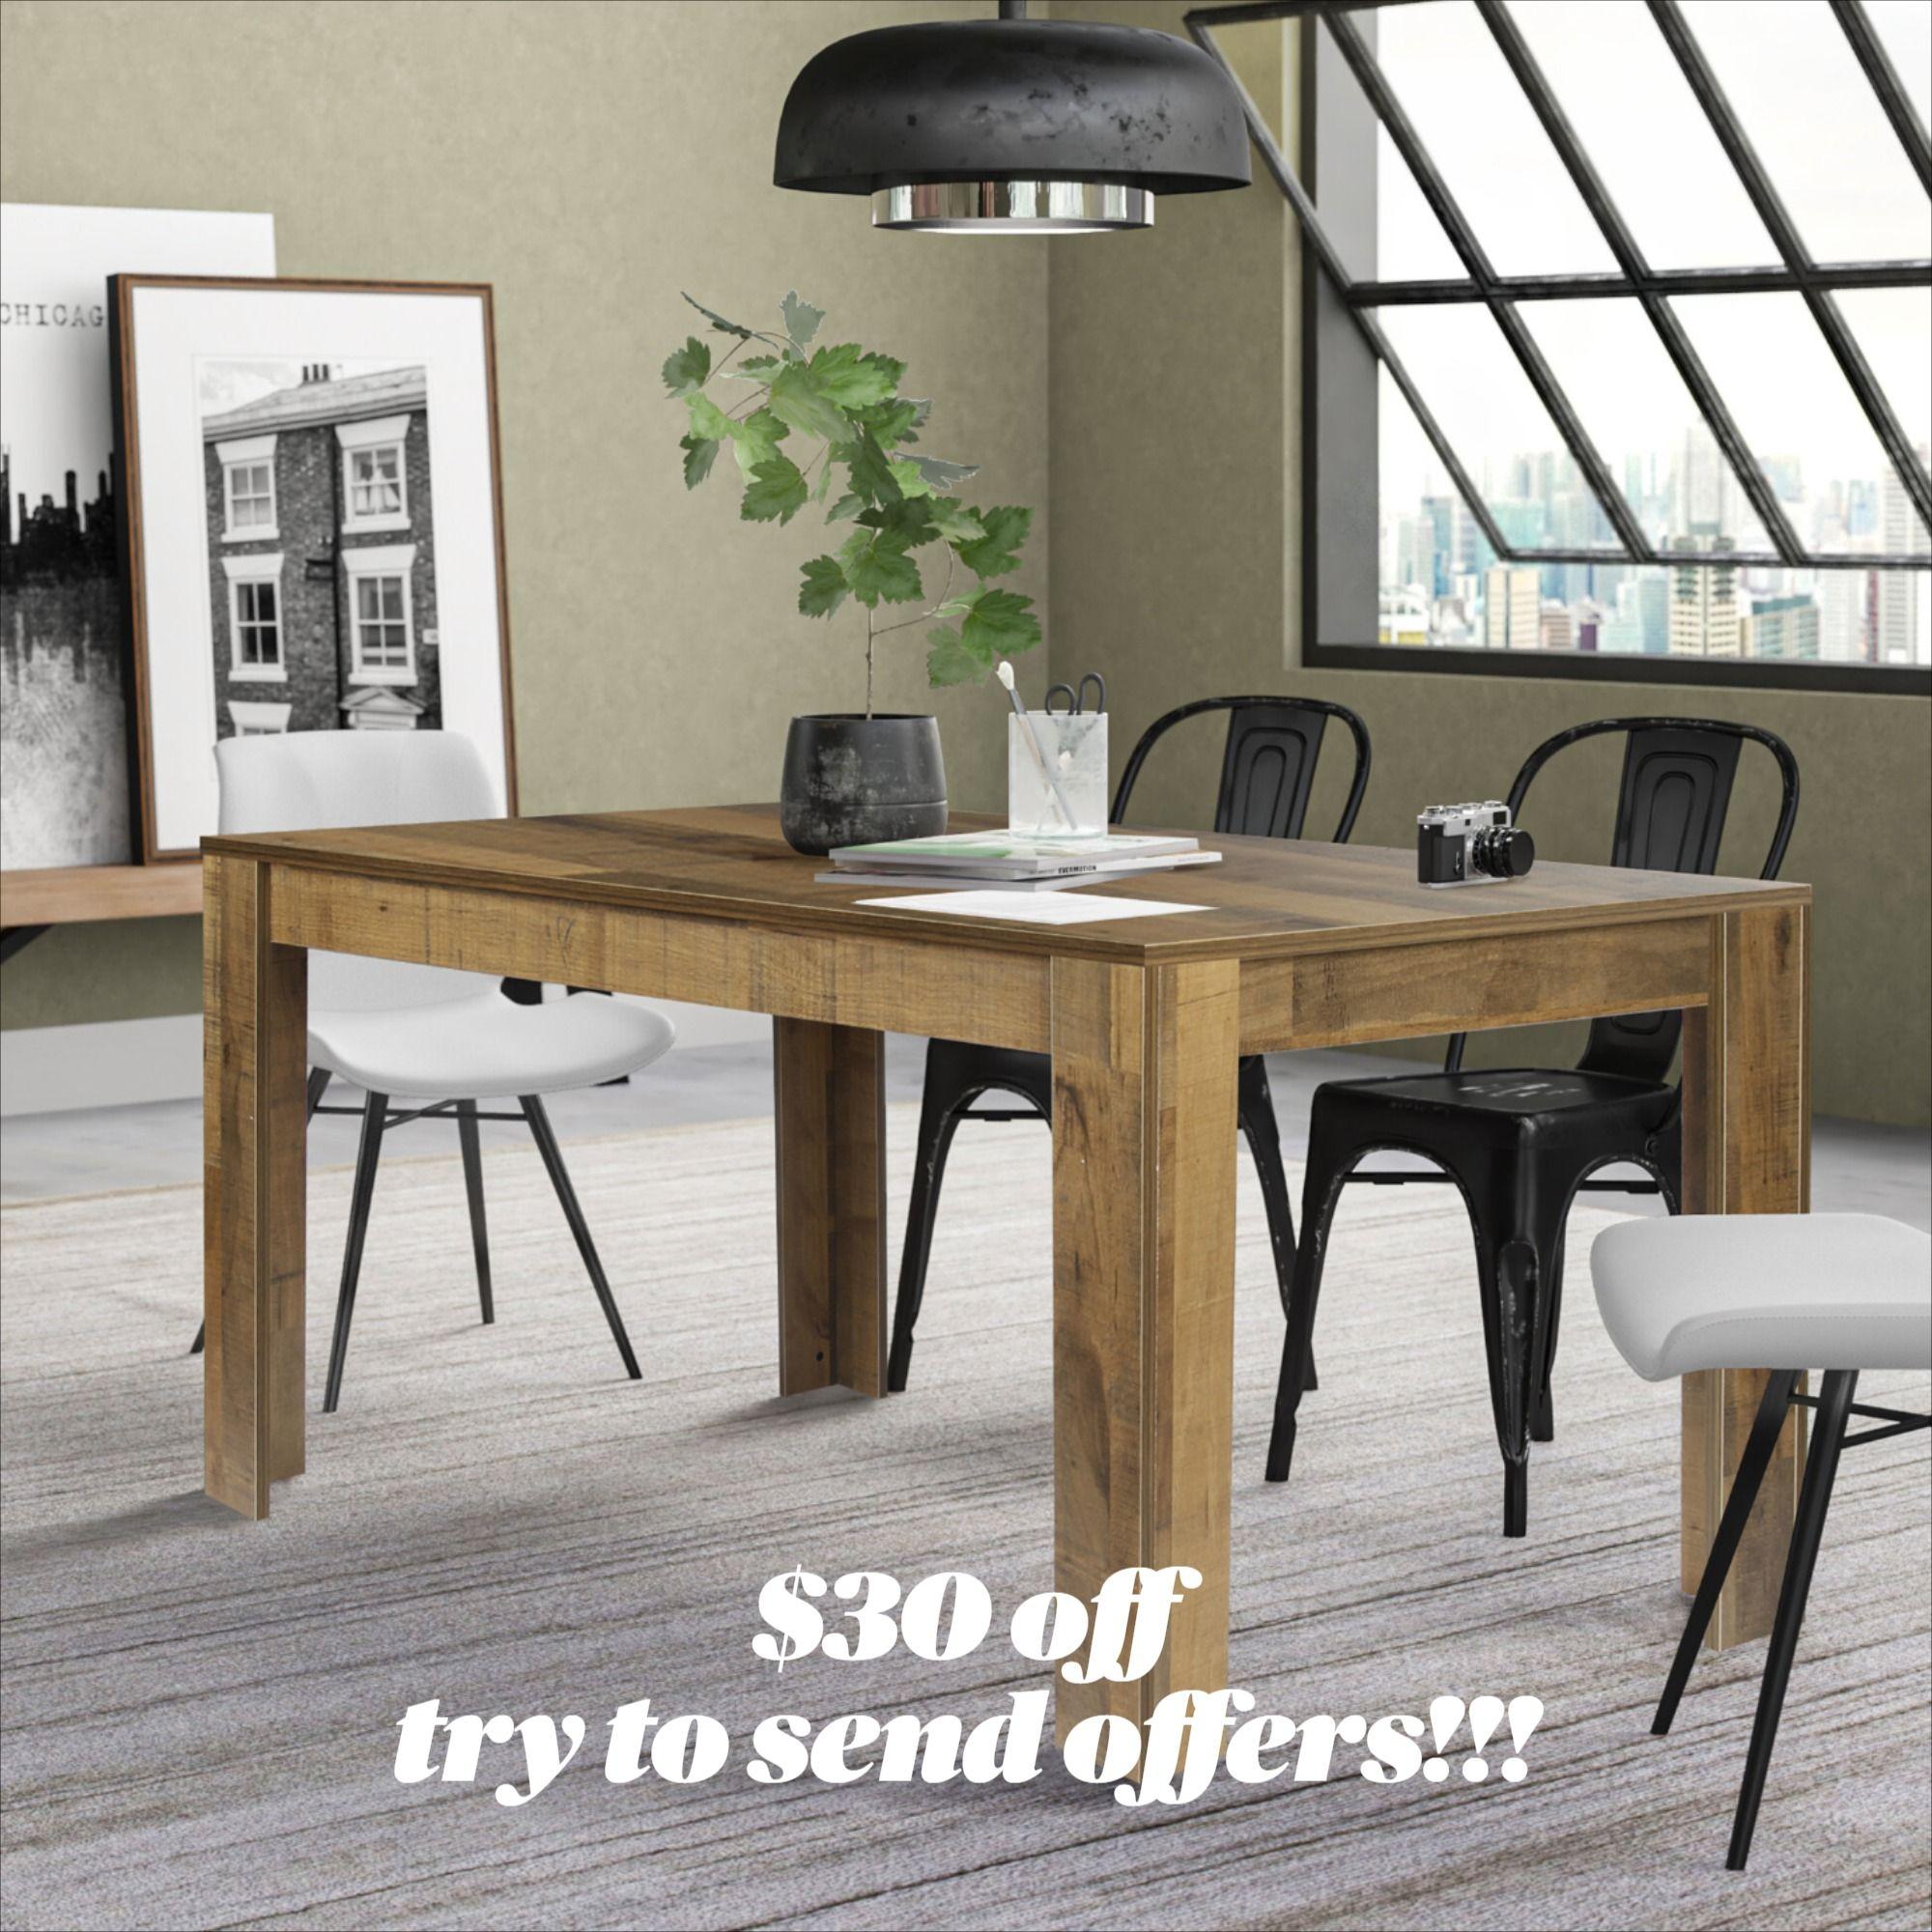 #diningtable #kitchentable #diningroomtable #homekitchen #rectangulartable #walnutcolortable #kitchenisland #homekitchenidea #ebaytable #ebayfurniture